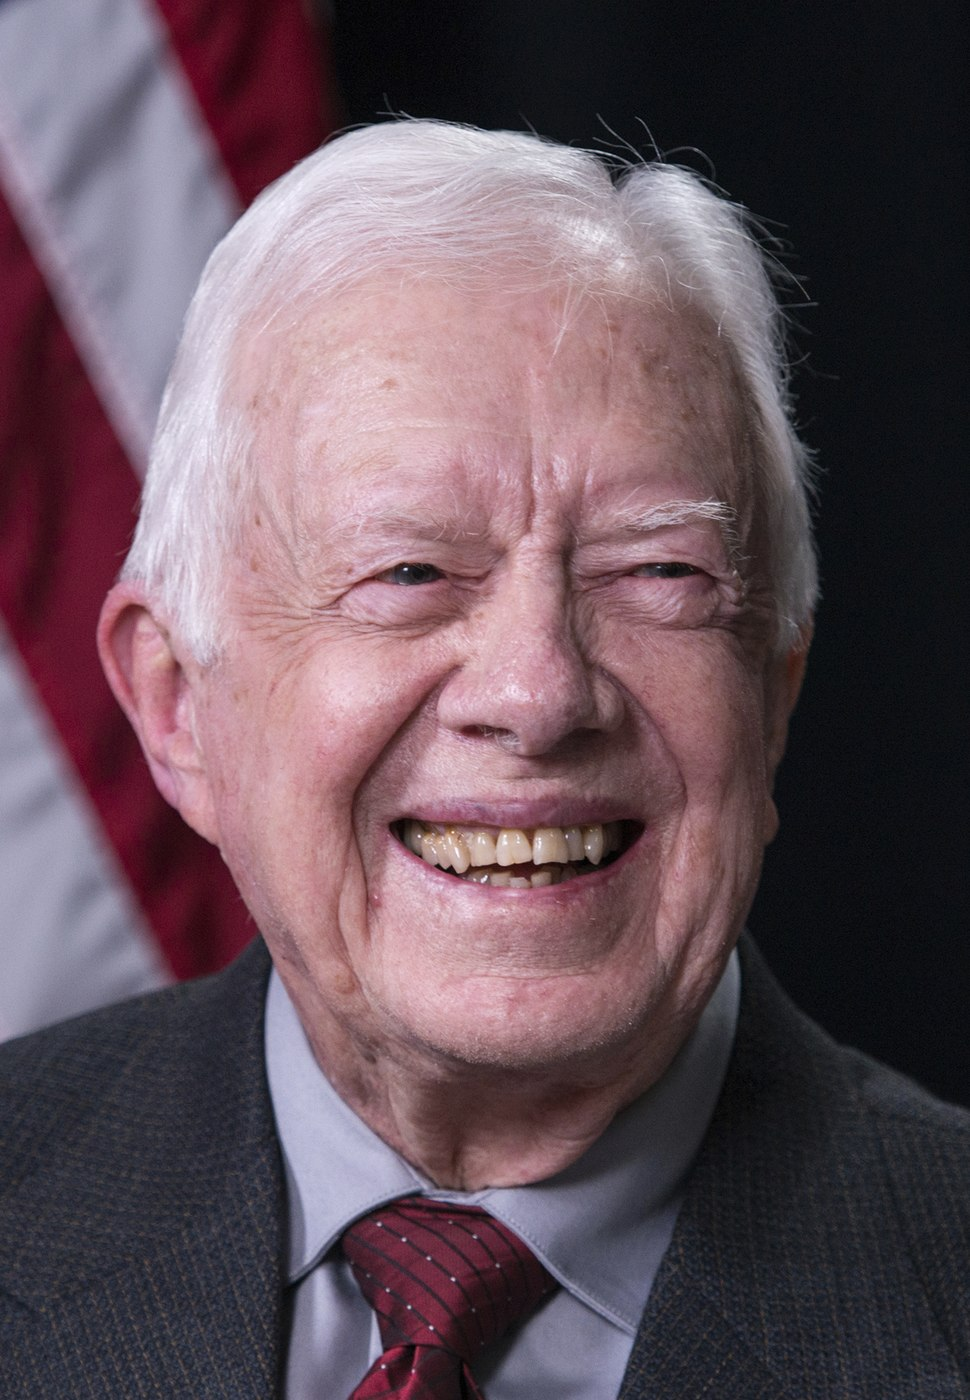 Jimmy Carter (age 93)since 1981